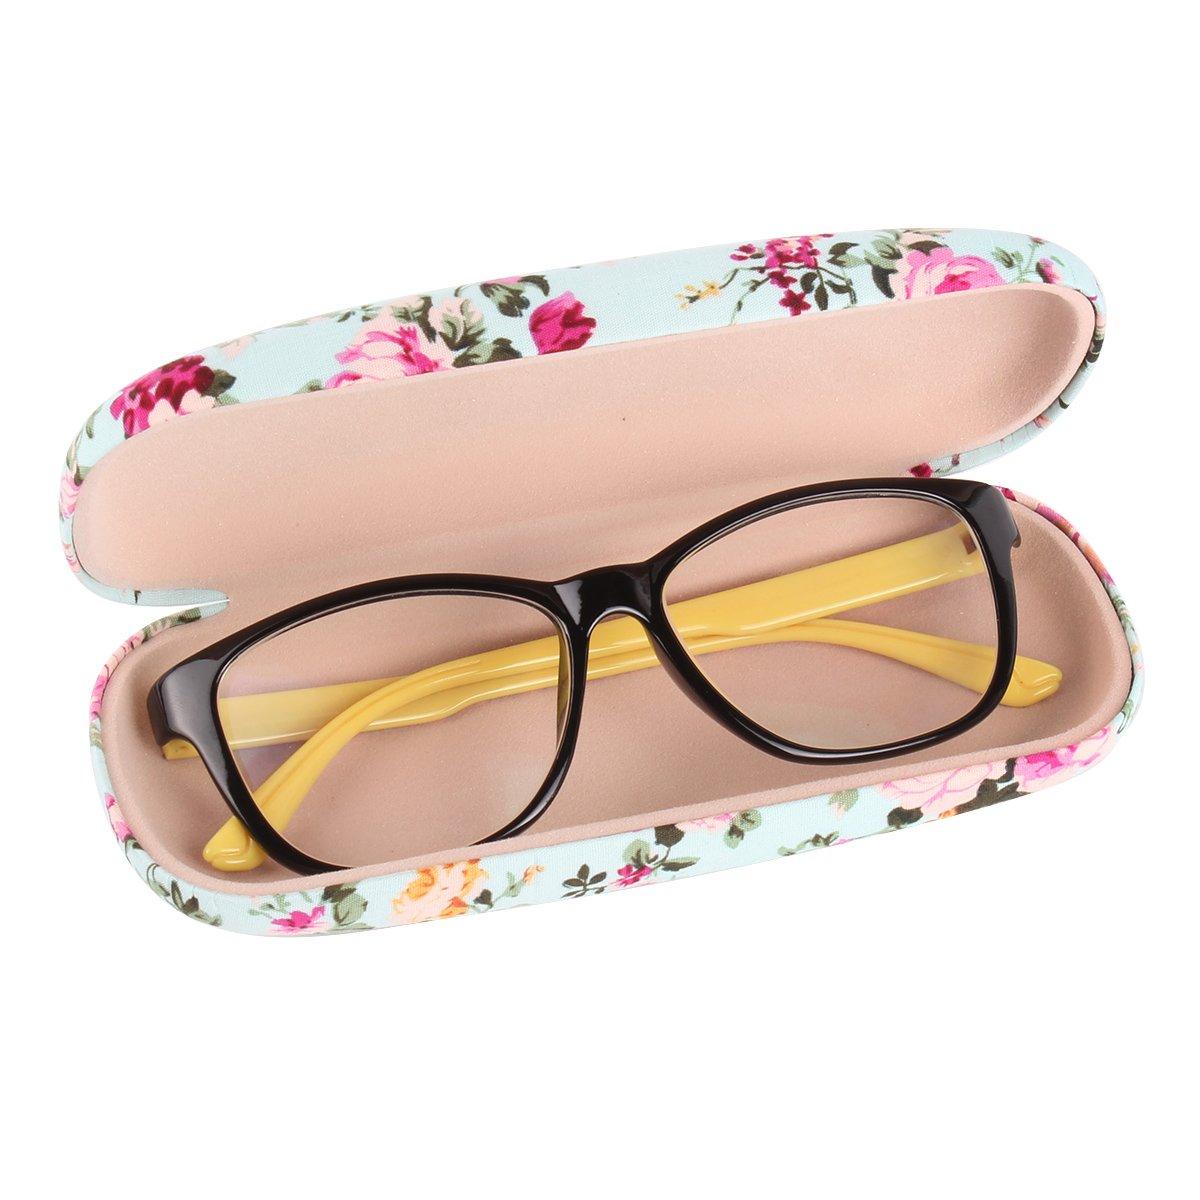 EZESO Fabrics Floral Retro Light Portable Eyeglasses Case (2 pcs blue+pink) by Ezeso (Image #2)